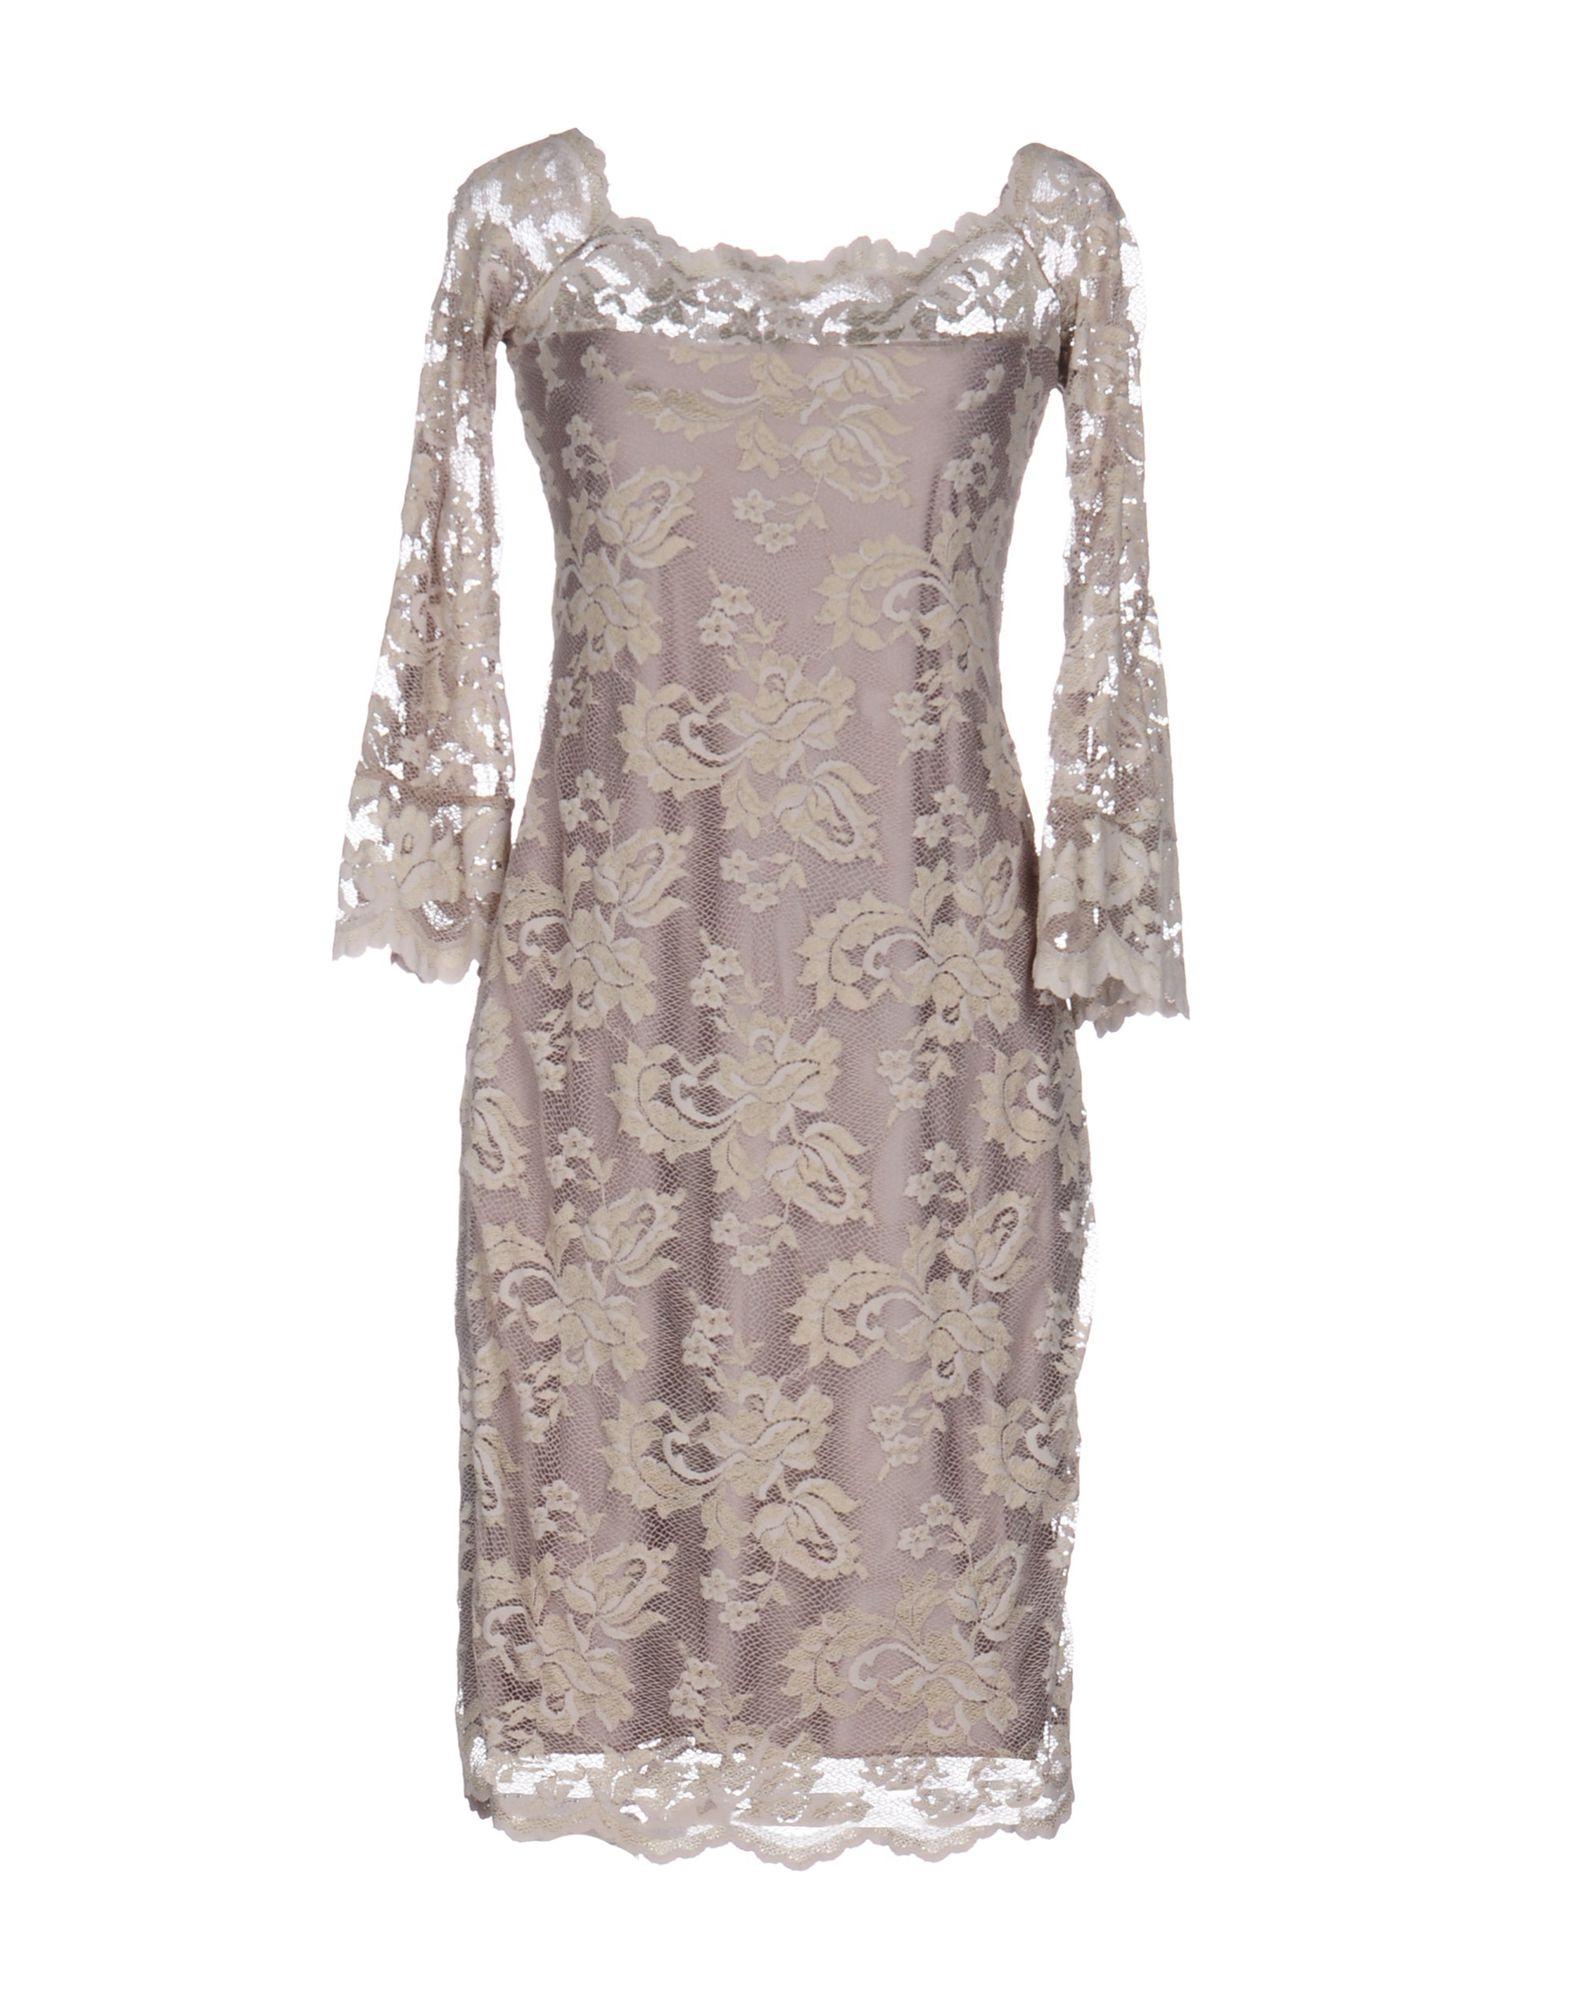 BALENSI Knee-Length Dress in Beige